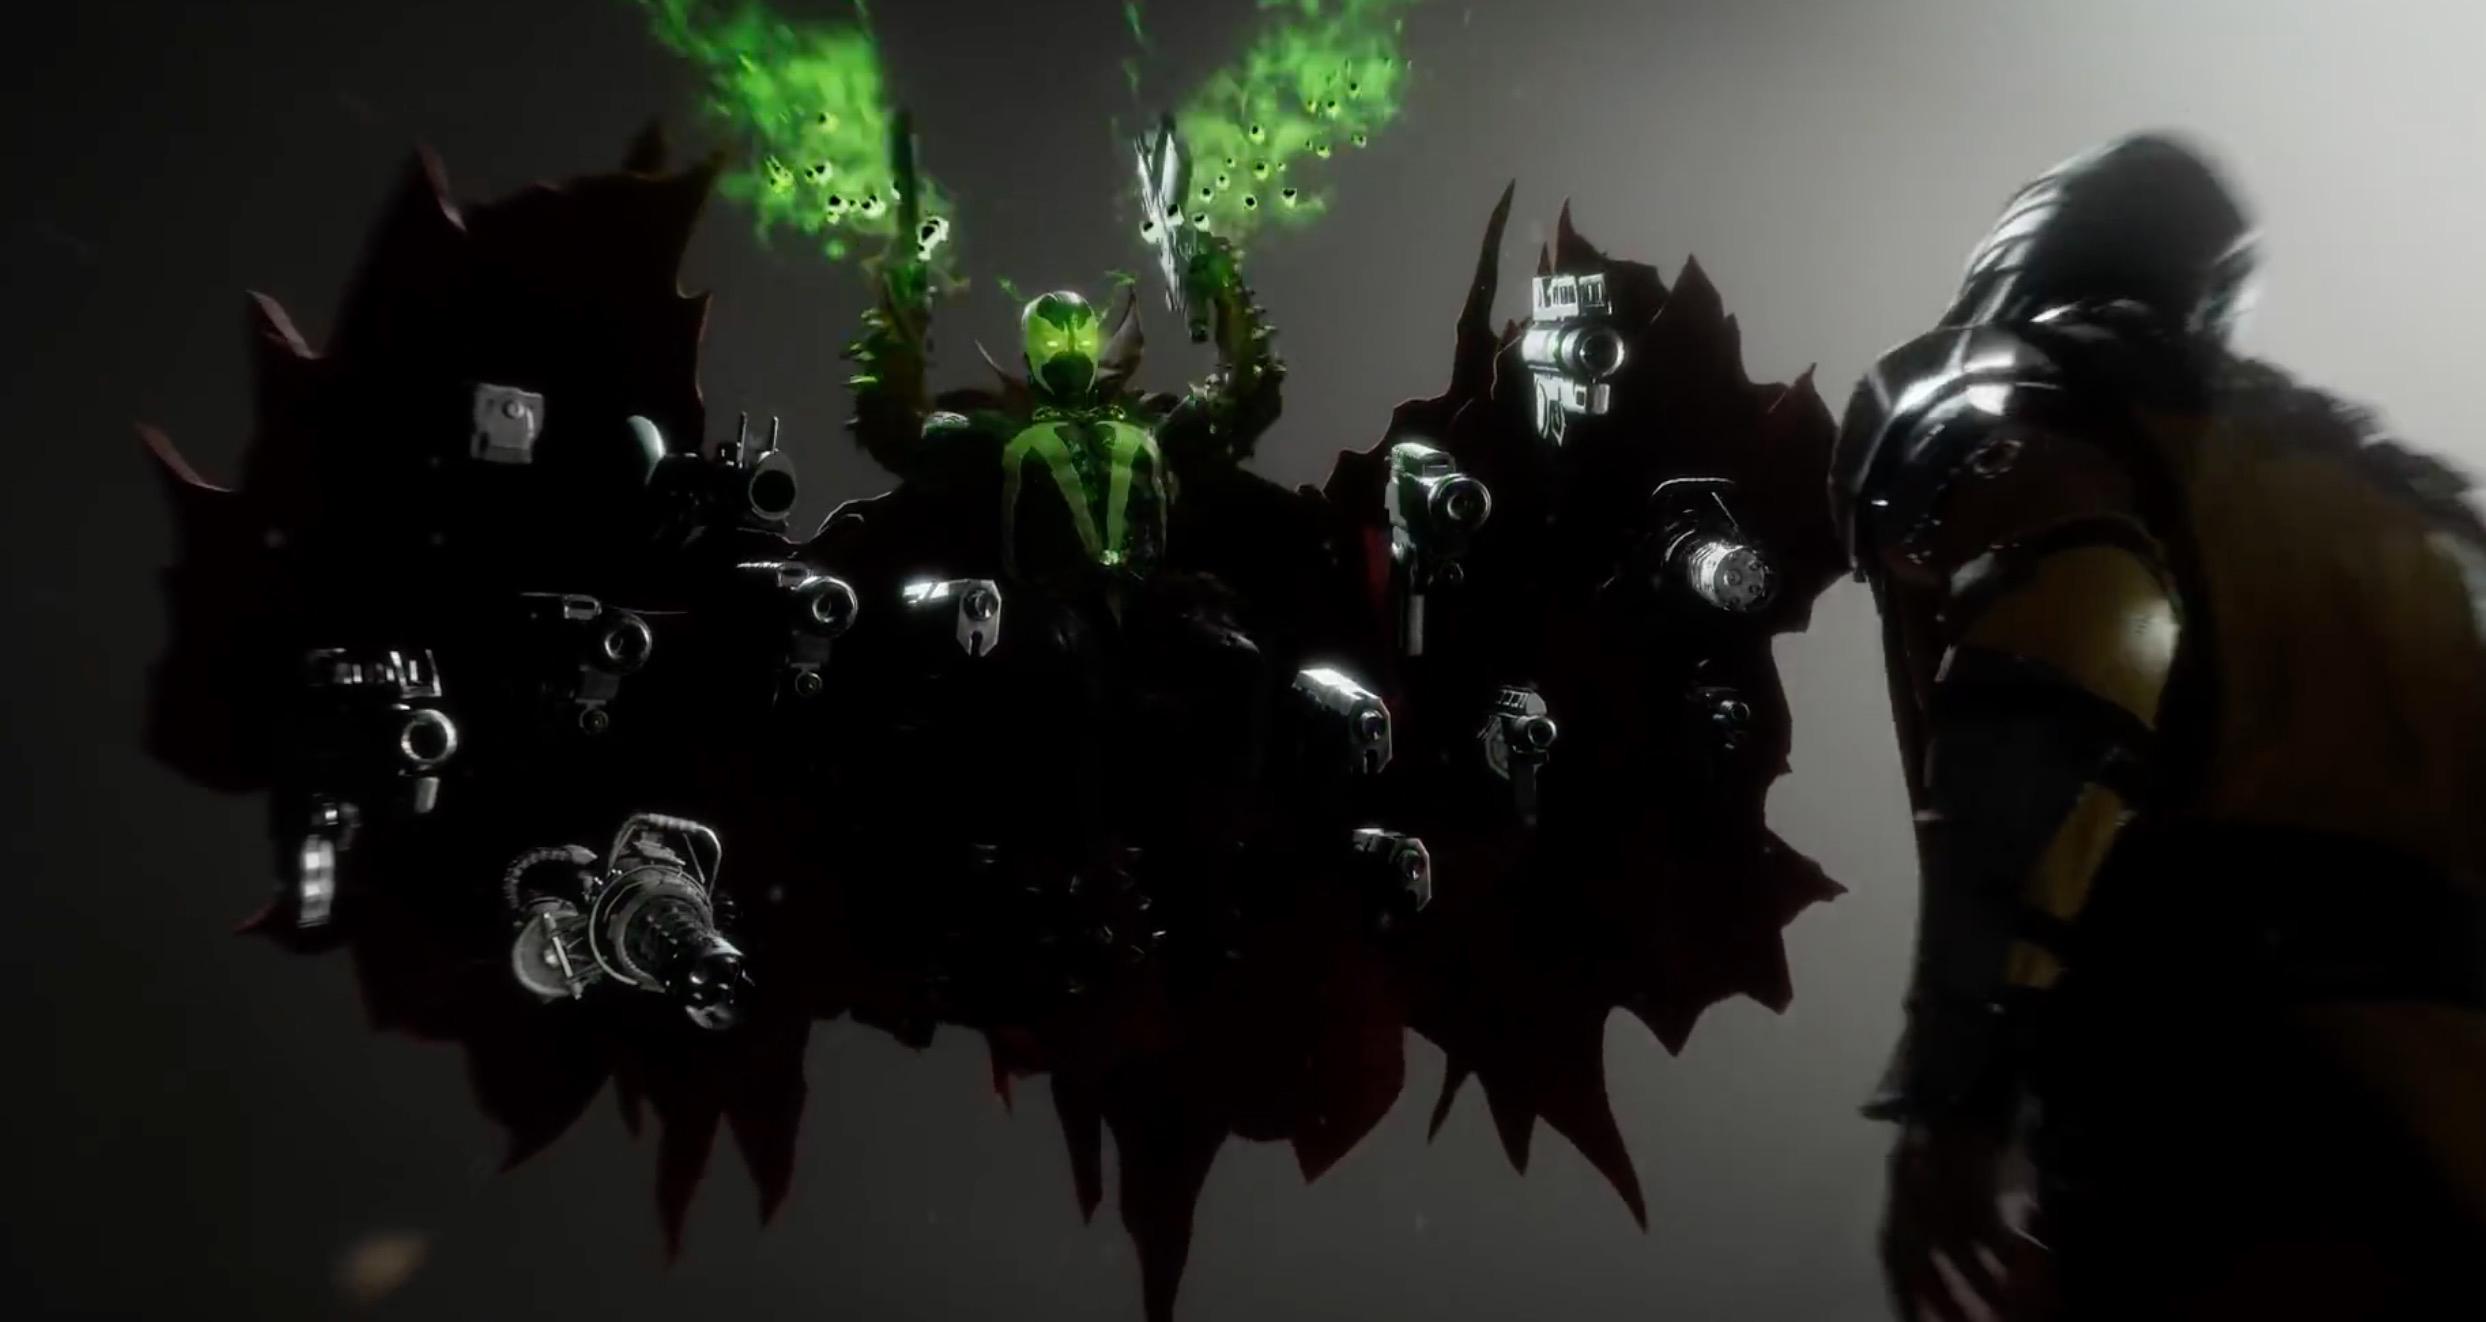 Spawn looks like one demonic addition to Mortal Kombat 11 screenshot